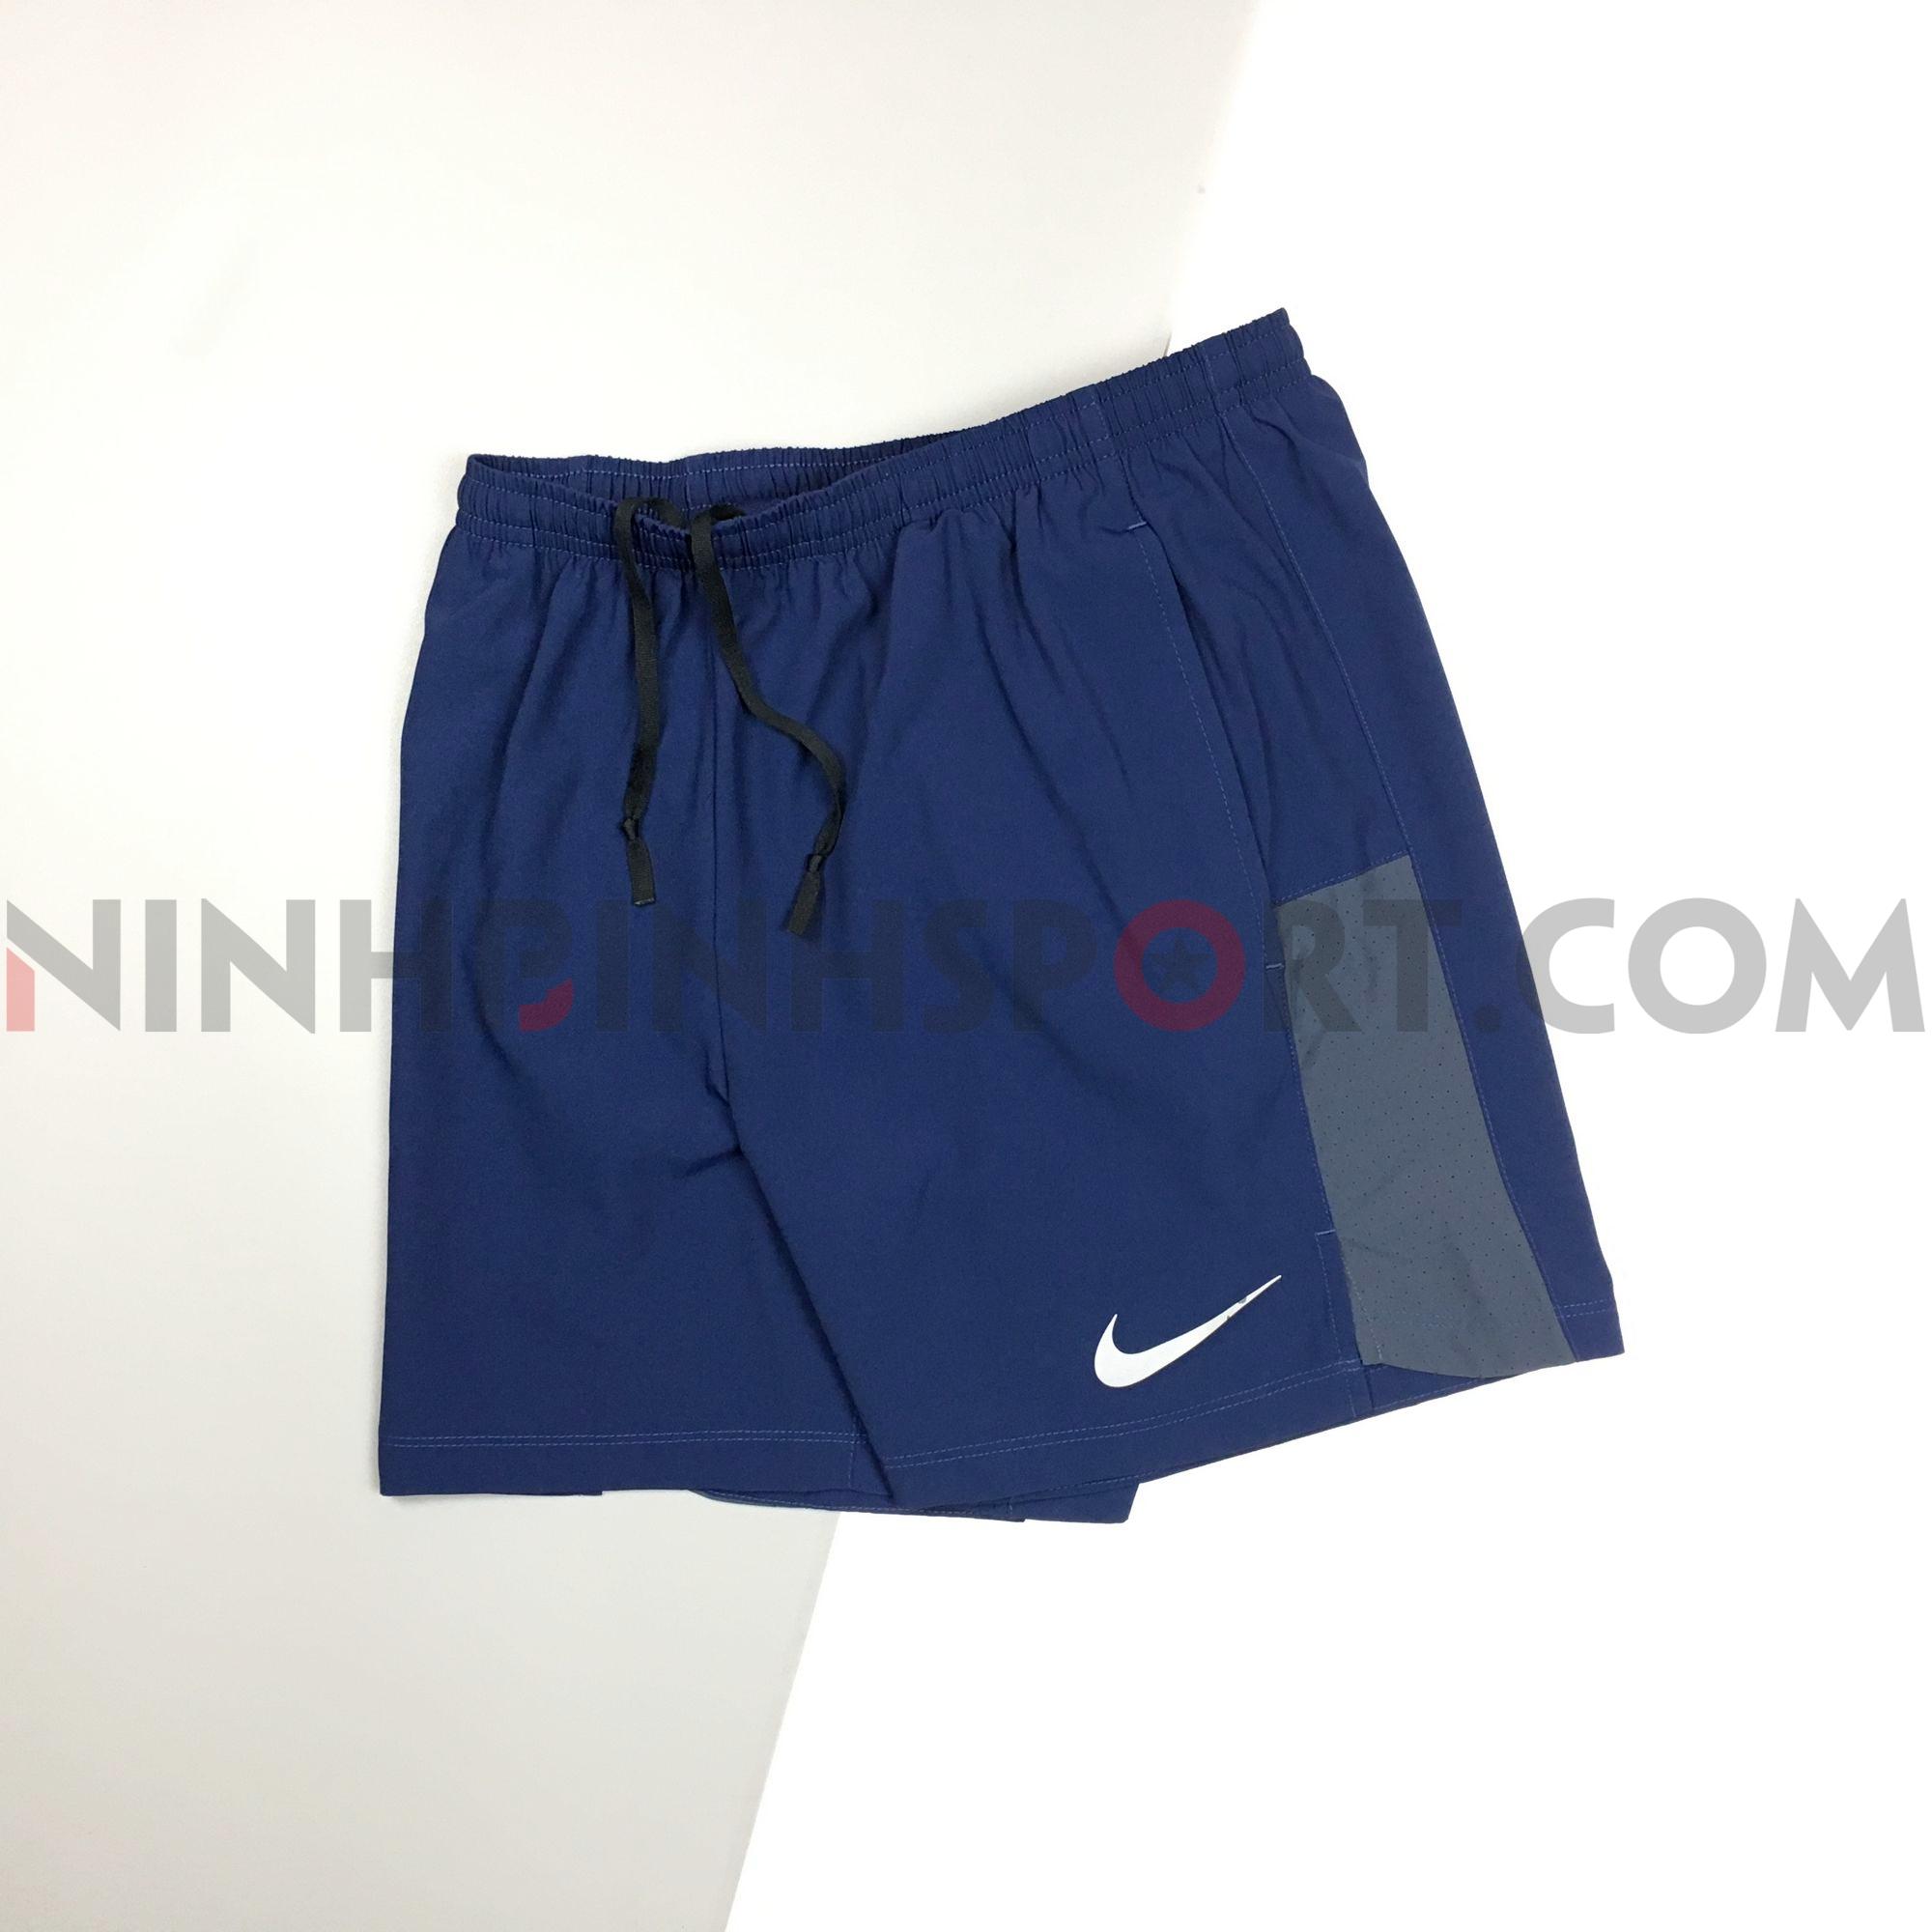 Quần thể thao nam NIKE Running Flex 5inch Shorts 856837-429